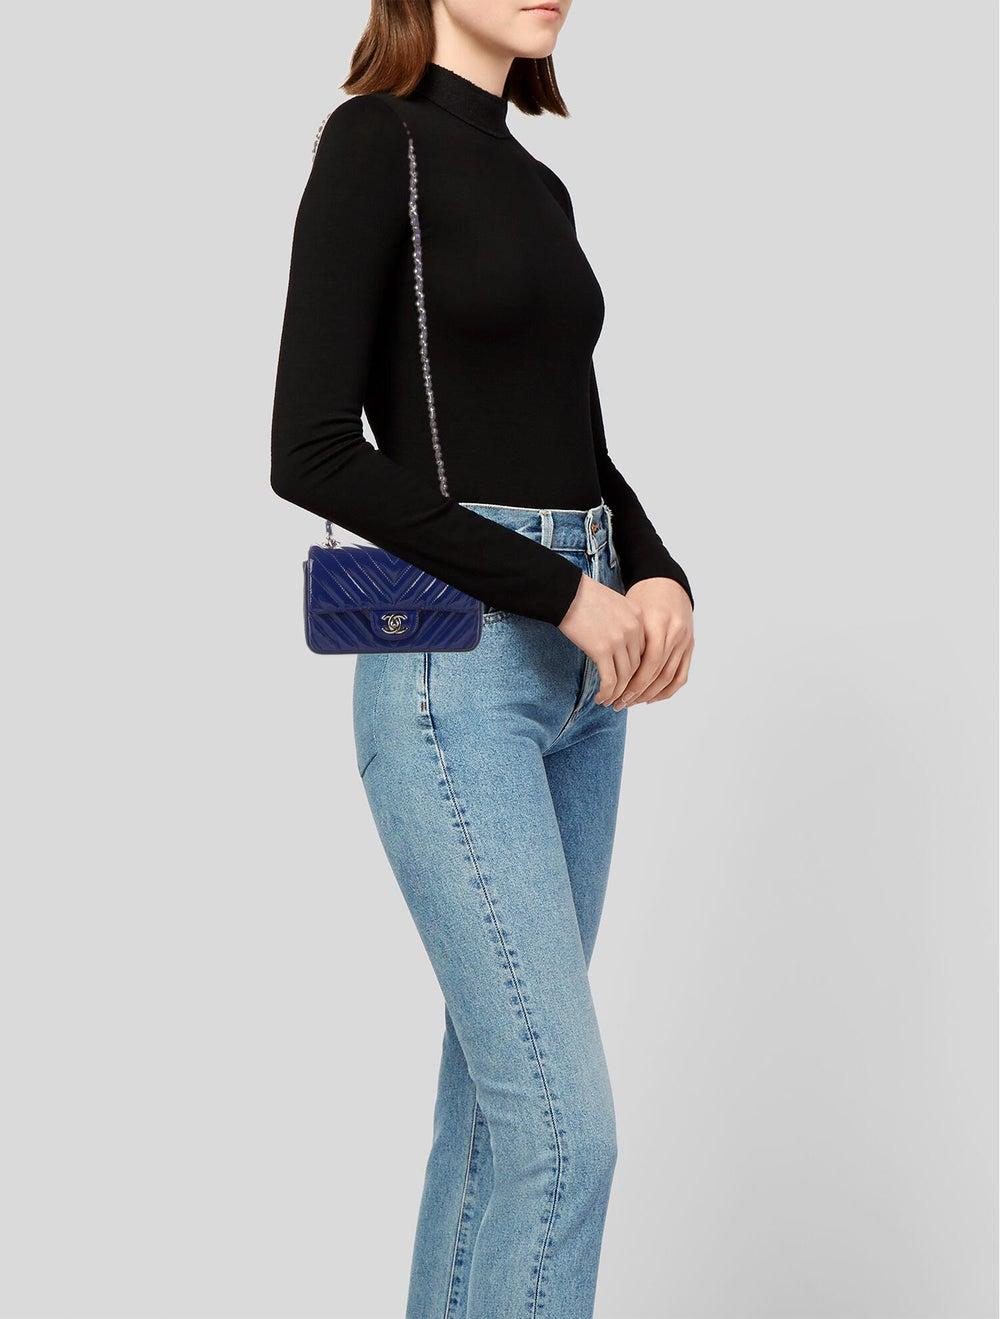 Chanel New Mini Chevron Flap Bag Blue - image 2